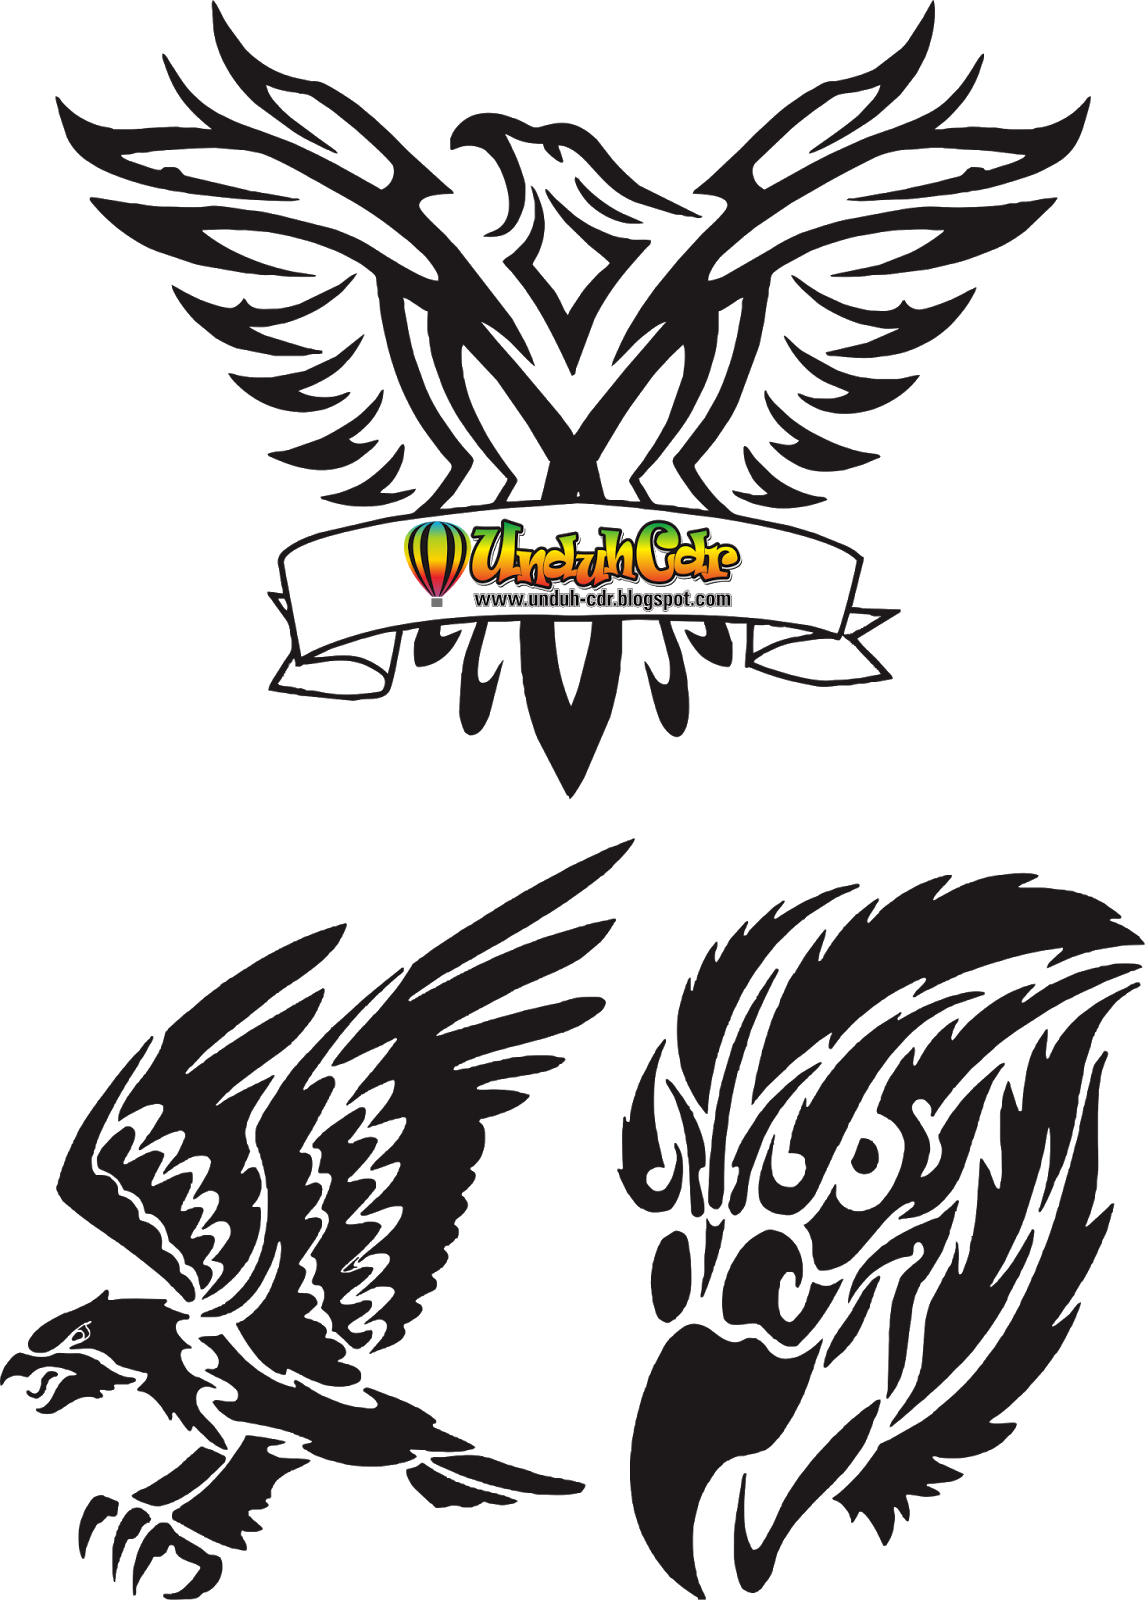 Gambar Unduh Cdr Gratis Download Tatto Elang Vector File